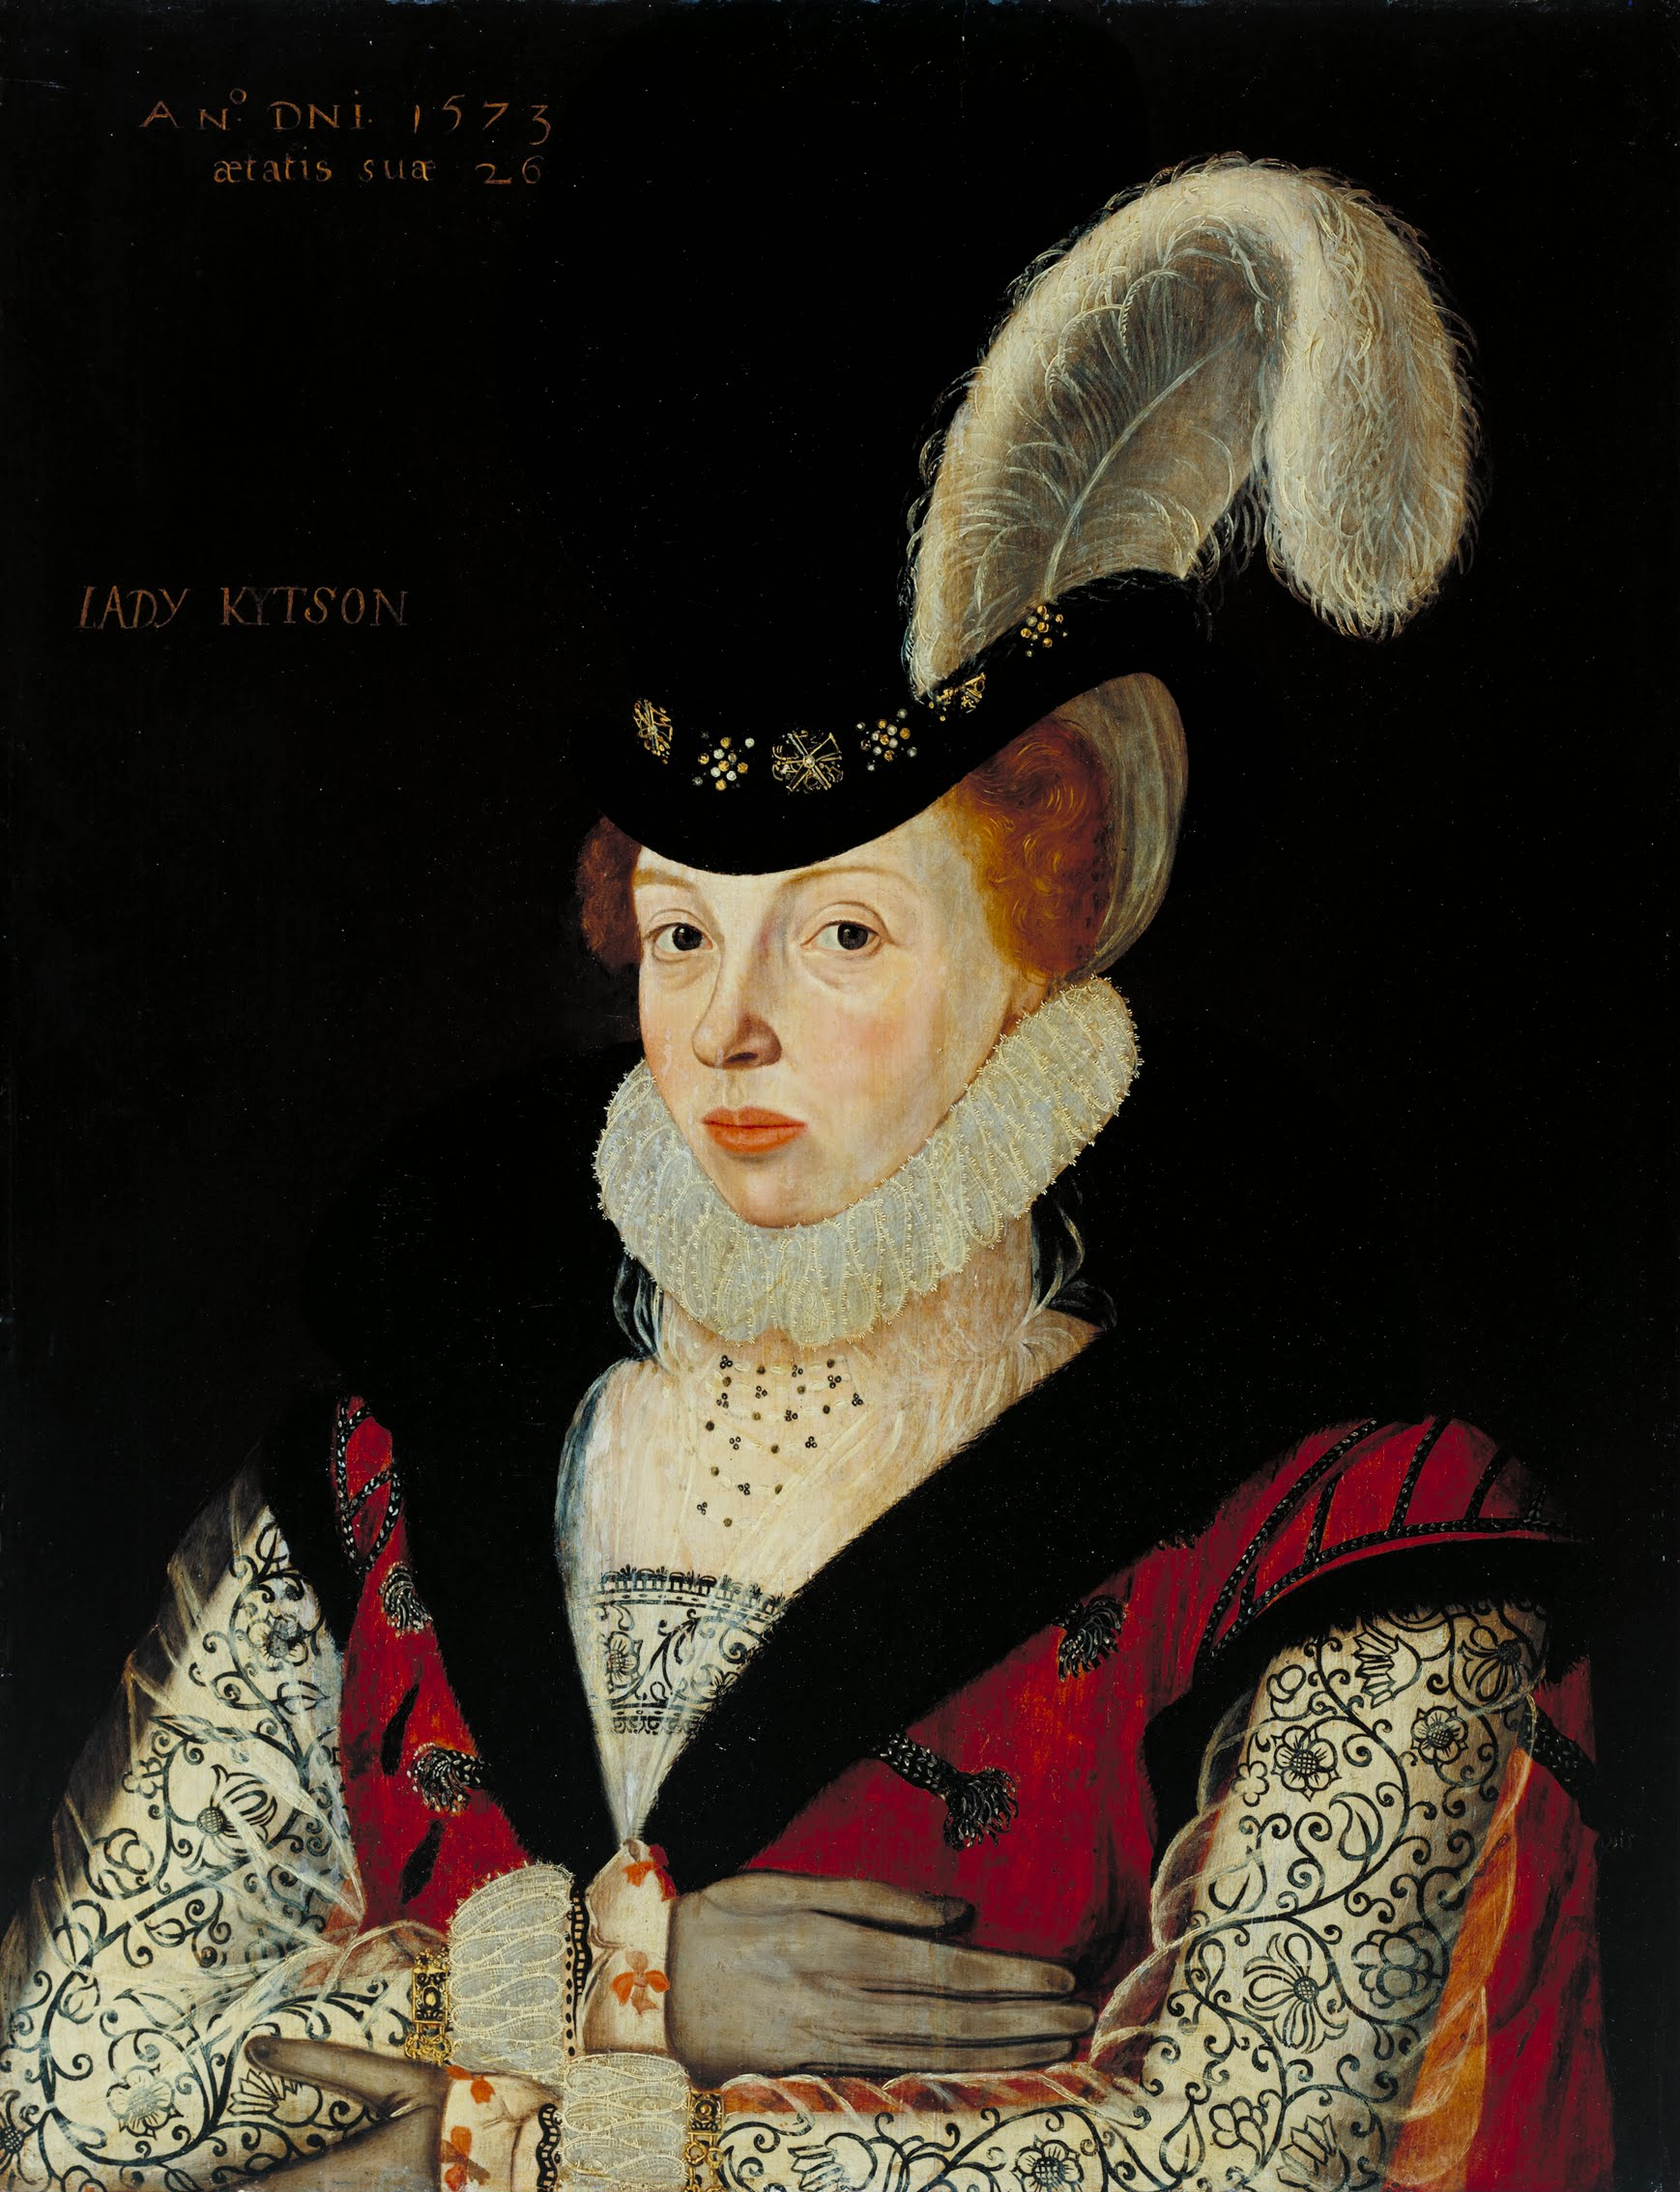 Wilbye's patron Elizabeth Kitson née Cornwallis. Painted in 1573, the year before Wilbye's birth, by [[George Gower